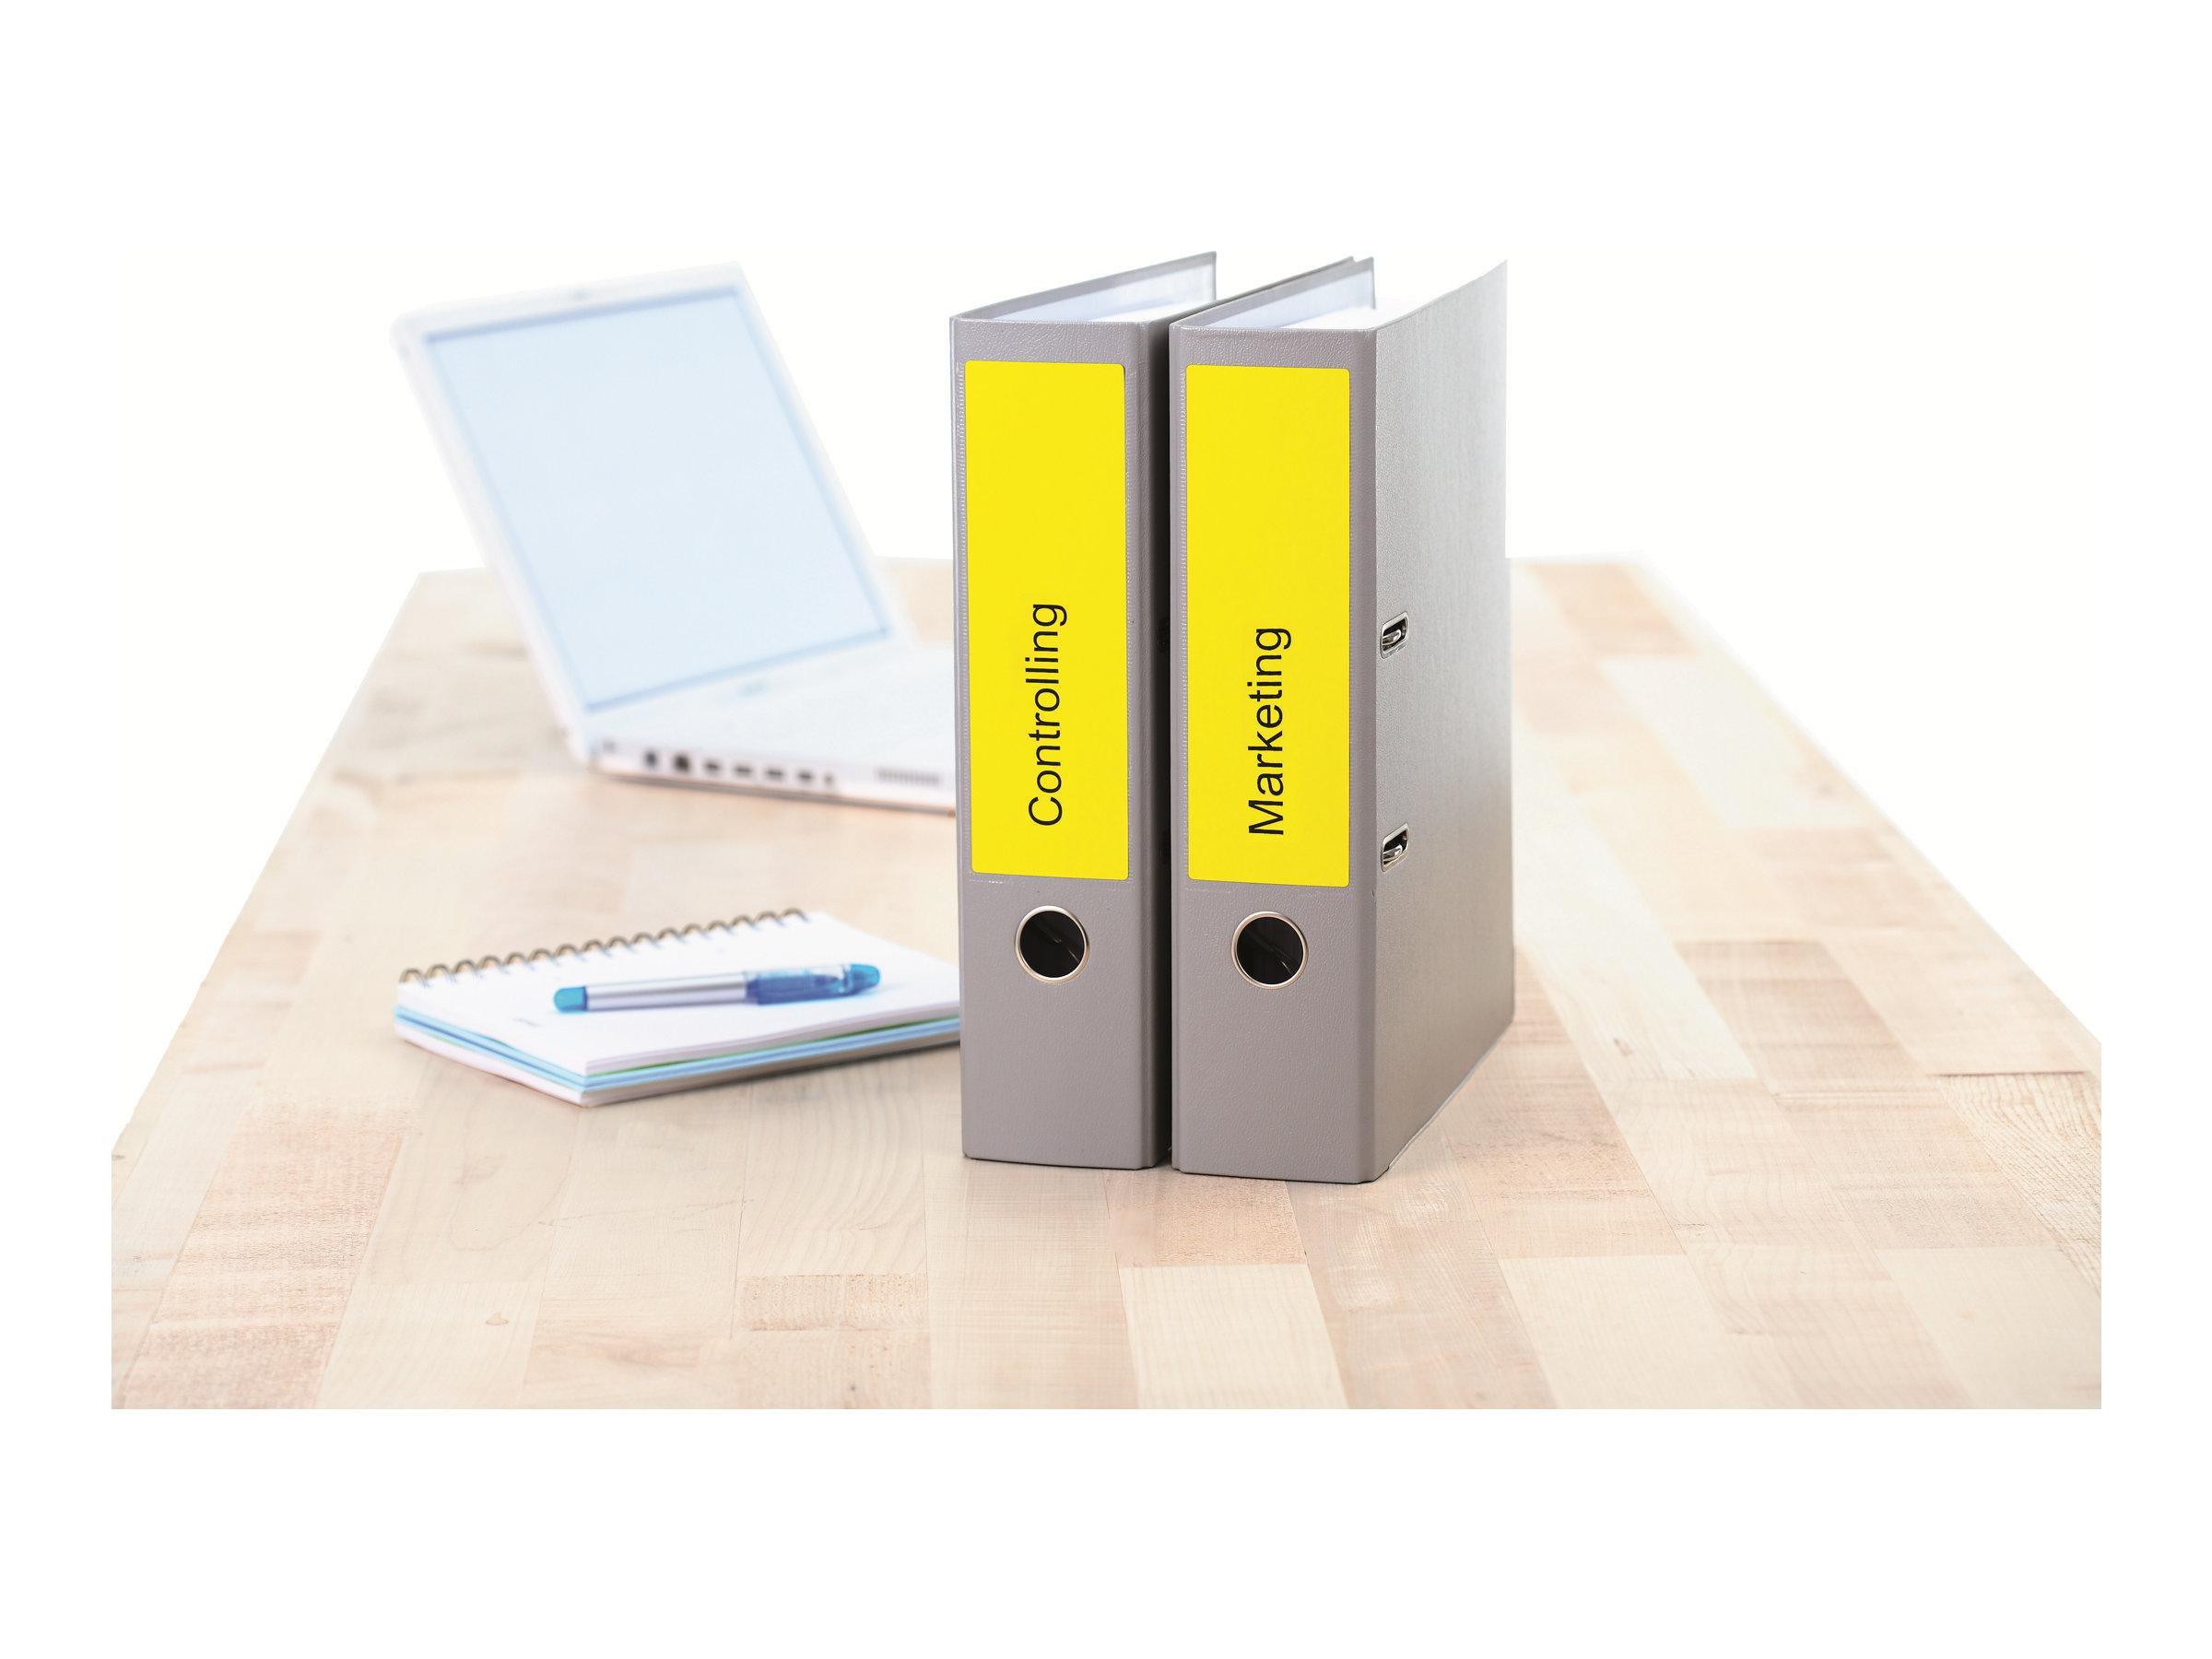 HERMA Special - Papier - matt - permanent selbstklebend - Gelb - 192 x 61 mm 400 Etikett(en) (100 Bogen x 4)